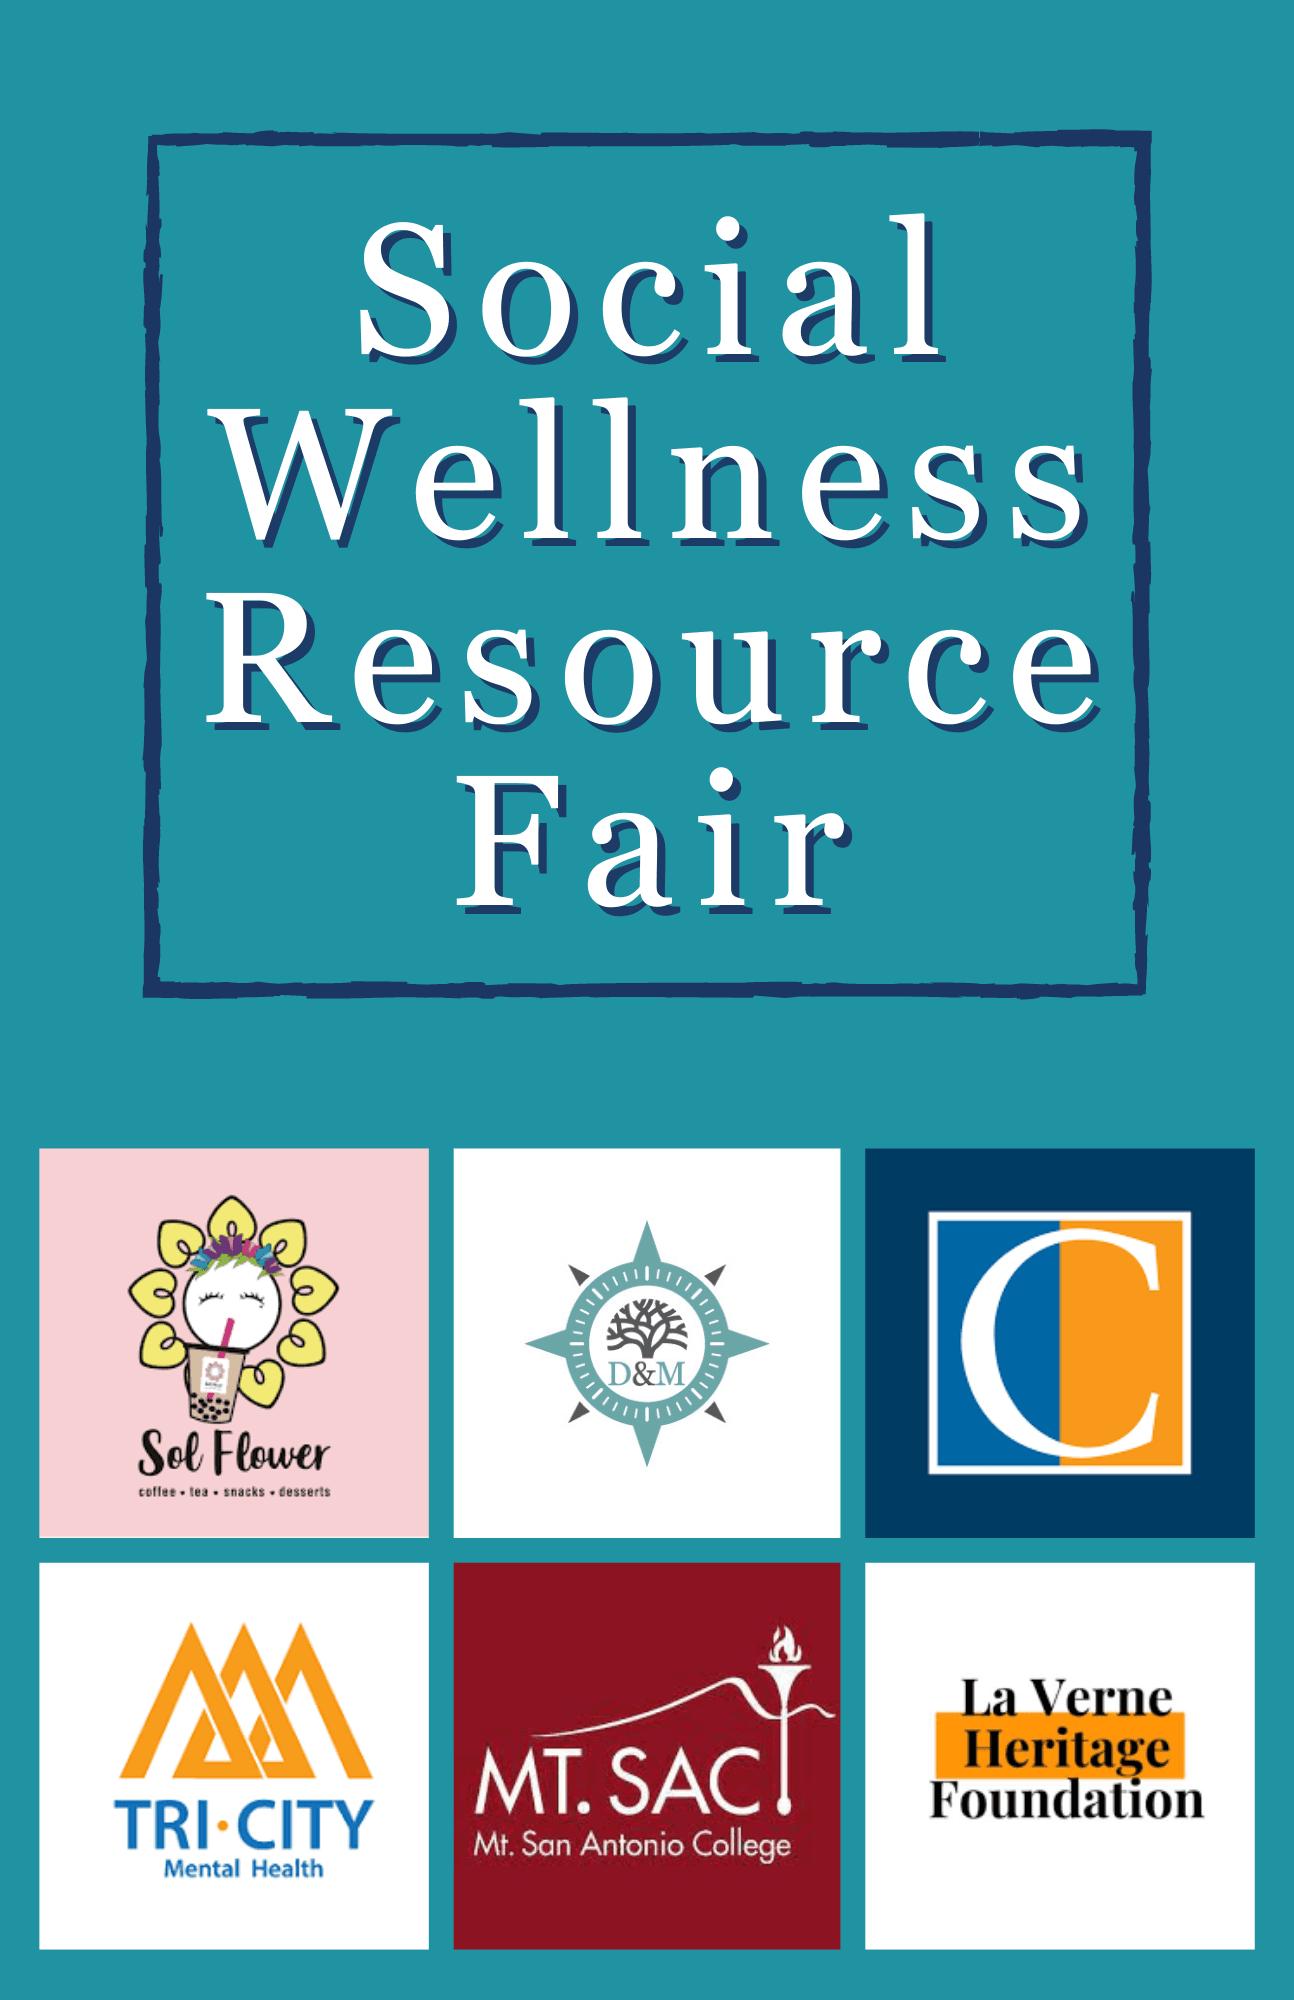 Social Wellness Resource Fair Recap